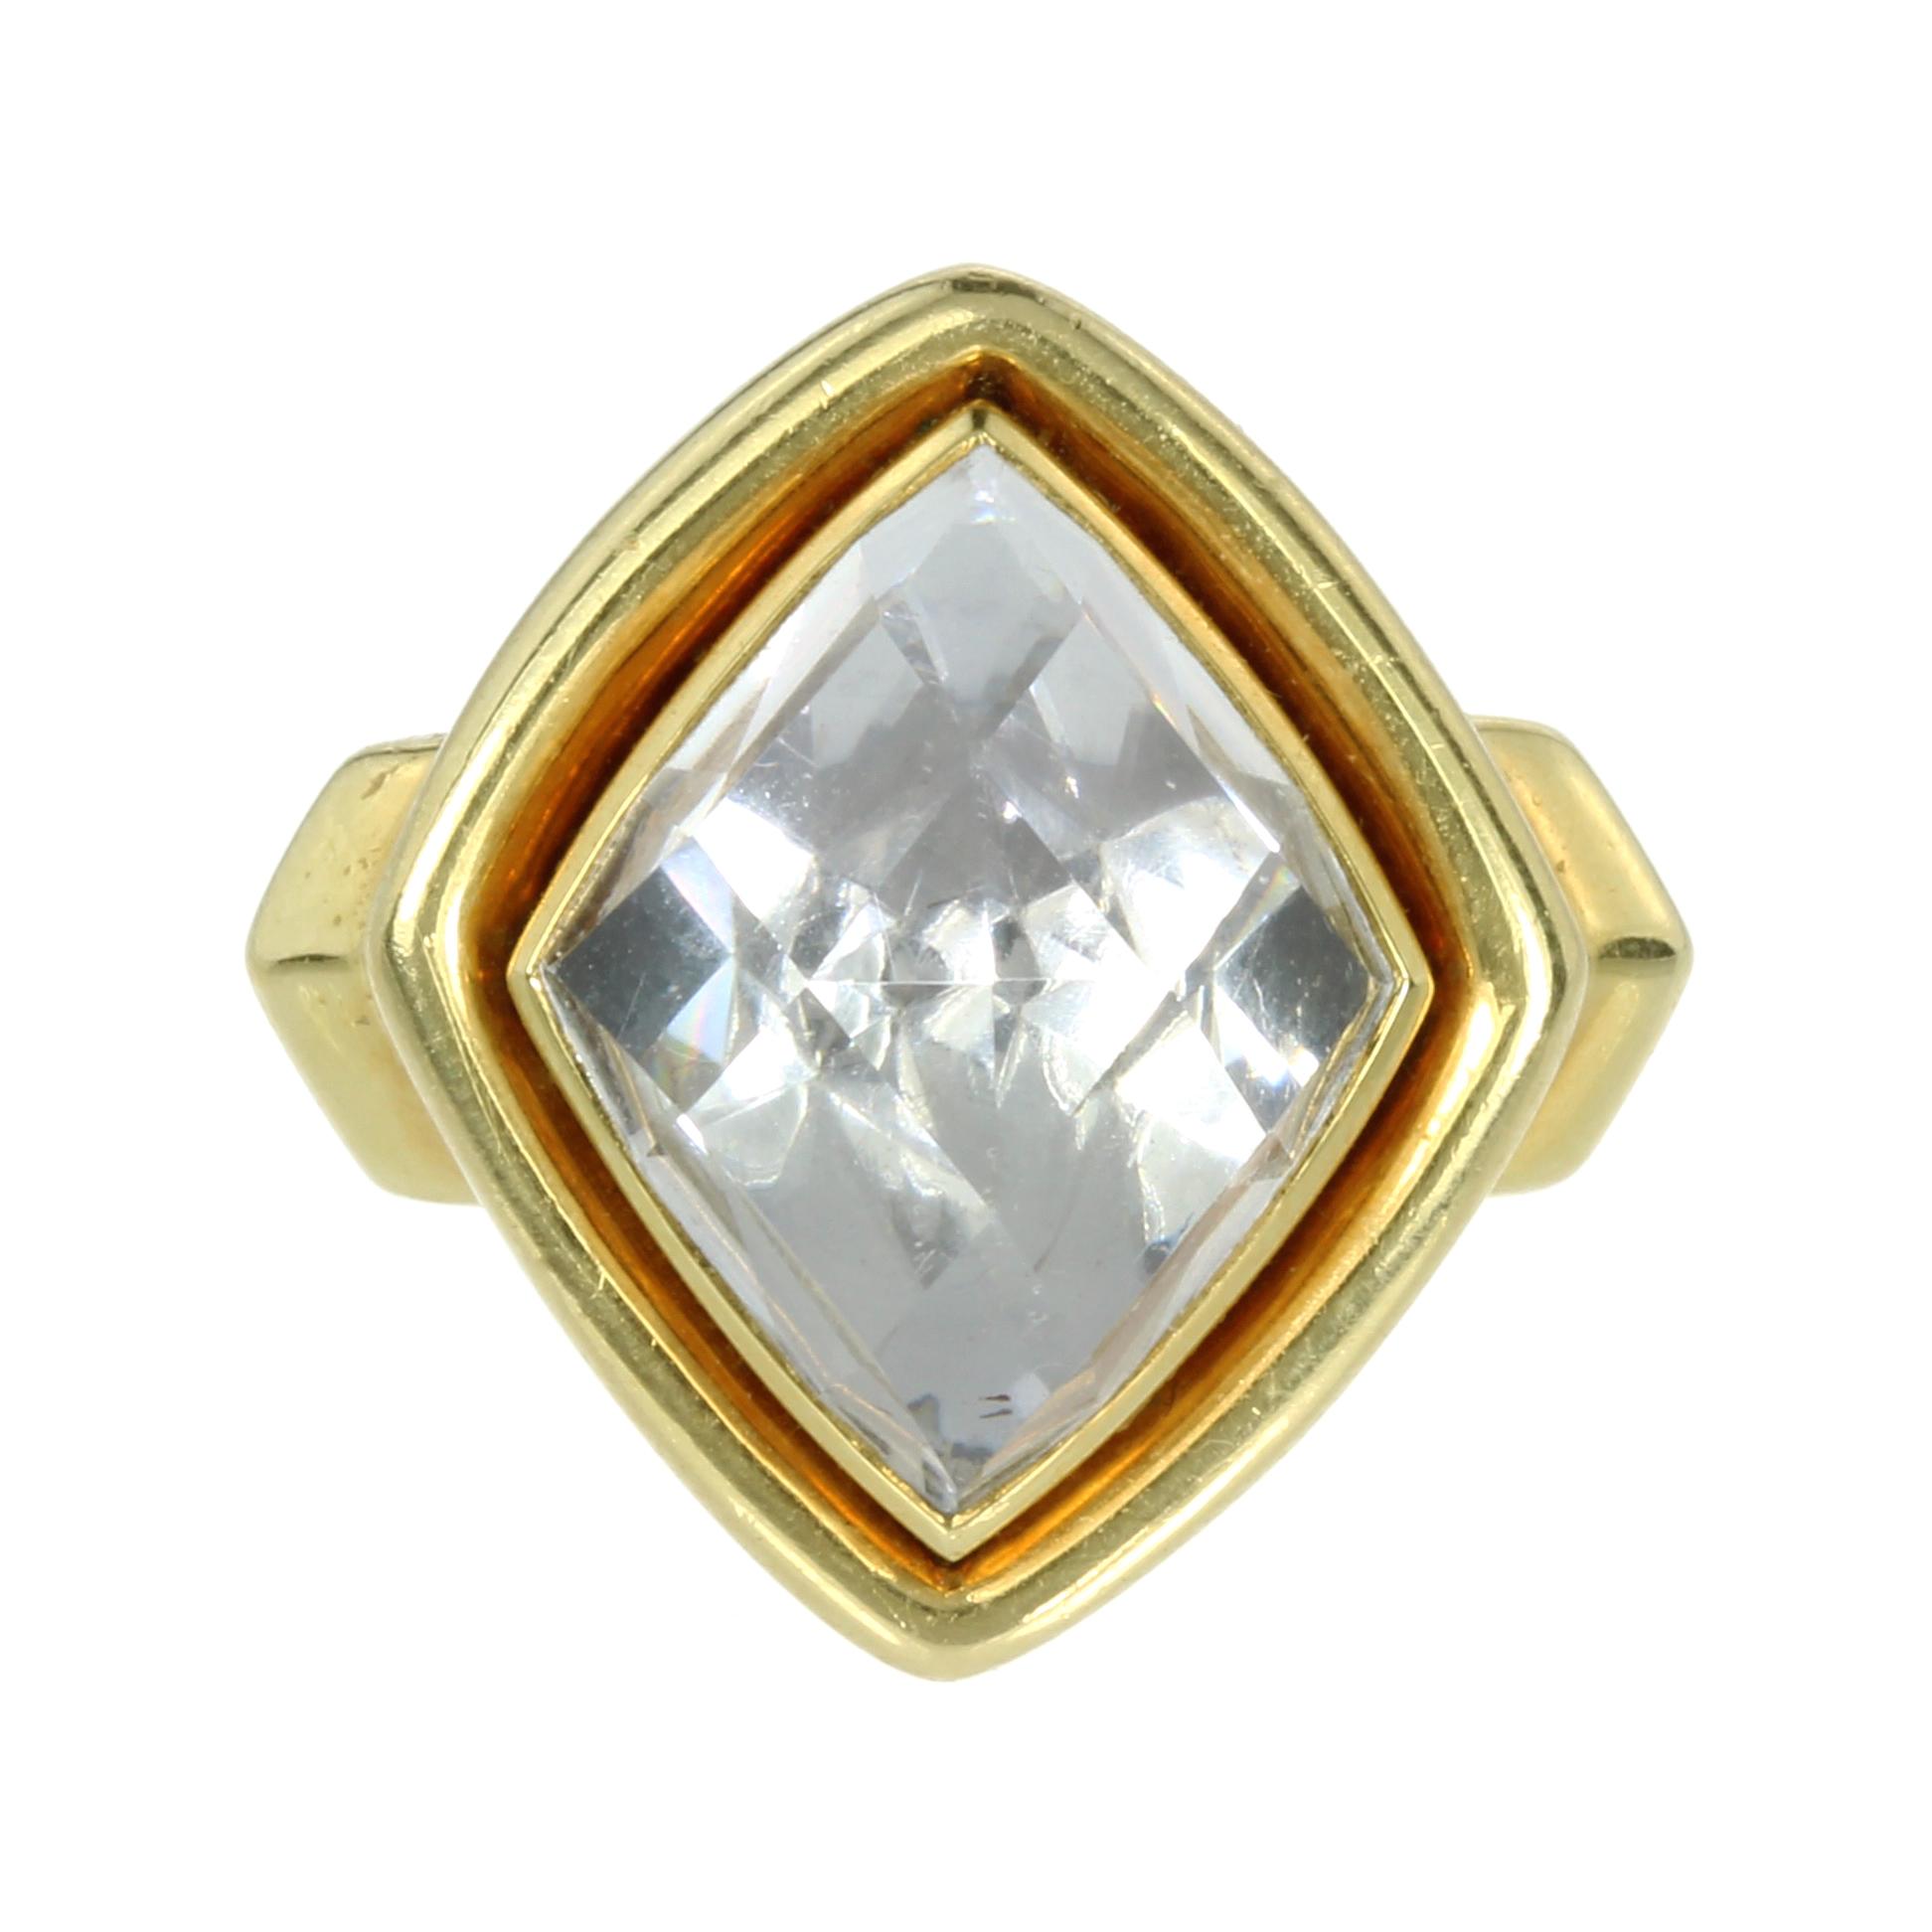 Los 1 - A ROCK CRYSTAL DRESS RING, DAVID WEBB CIRCA 1970 designed as a large, deep diamond shaped rose cut